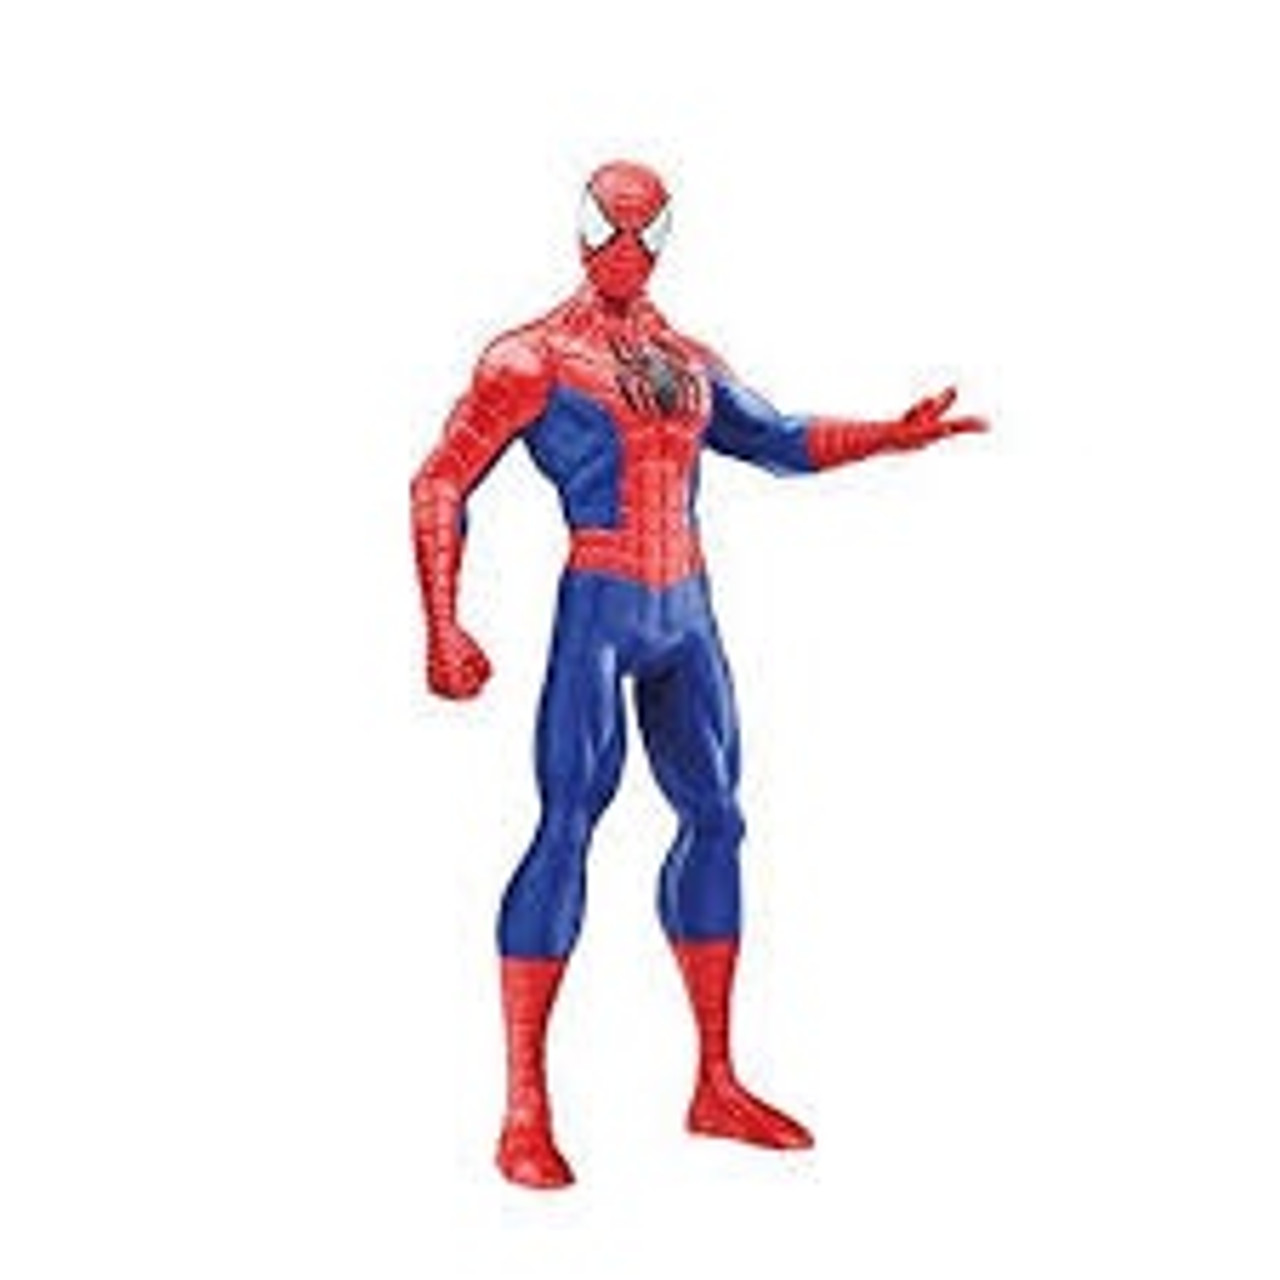 MARVEL SPIDER-MAN 6 INCHES